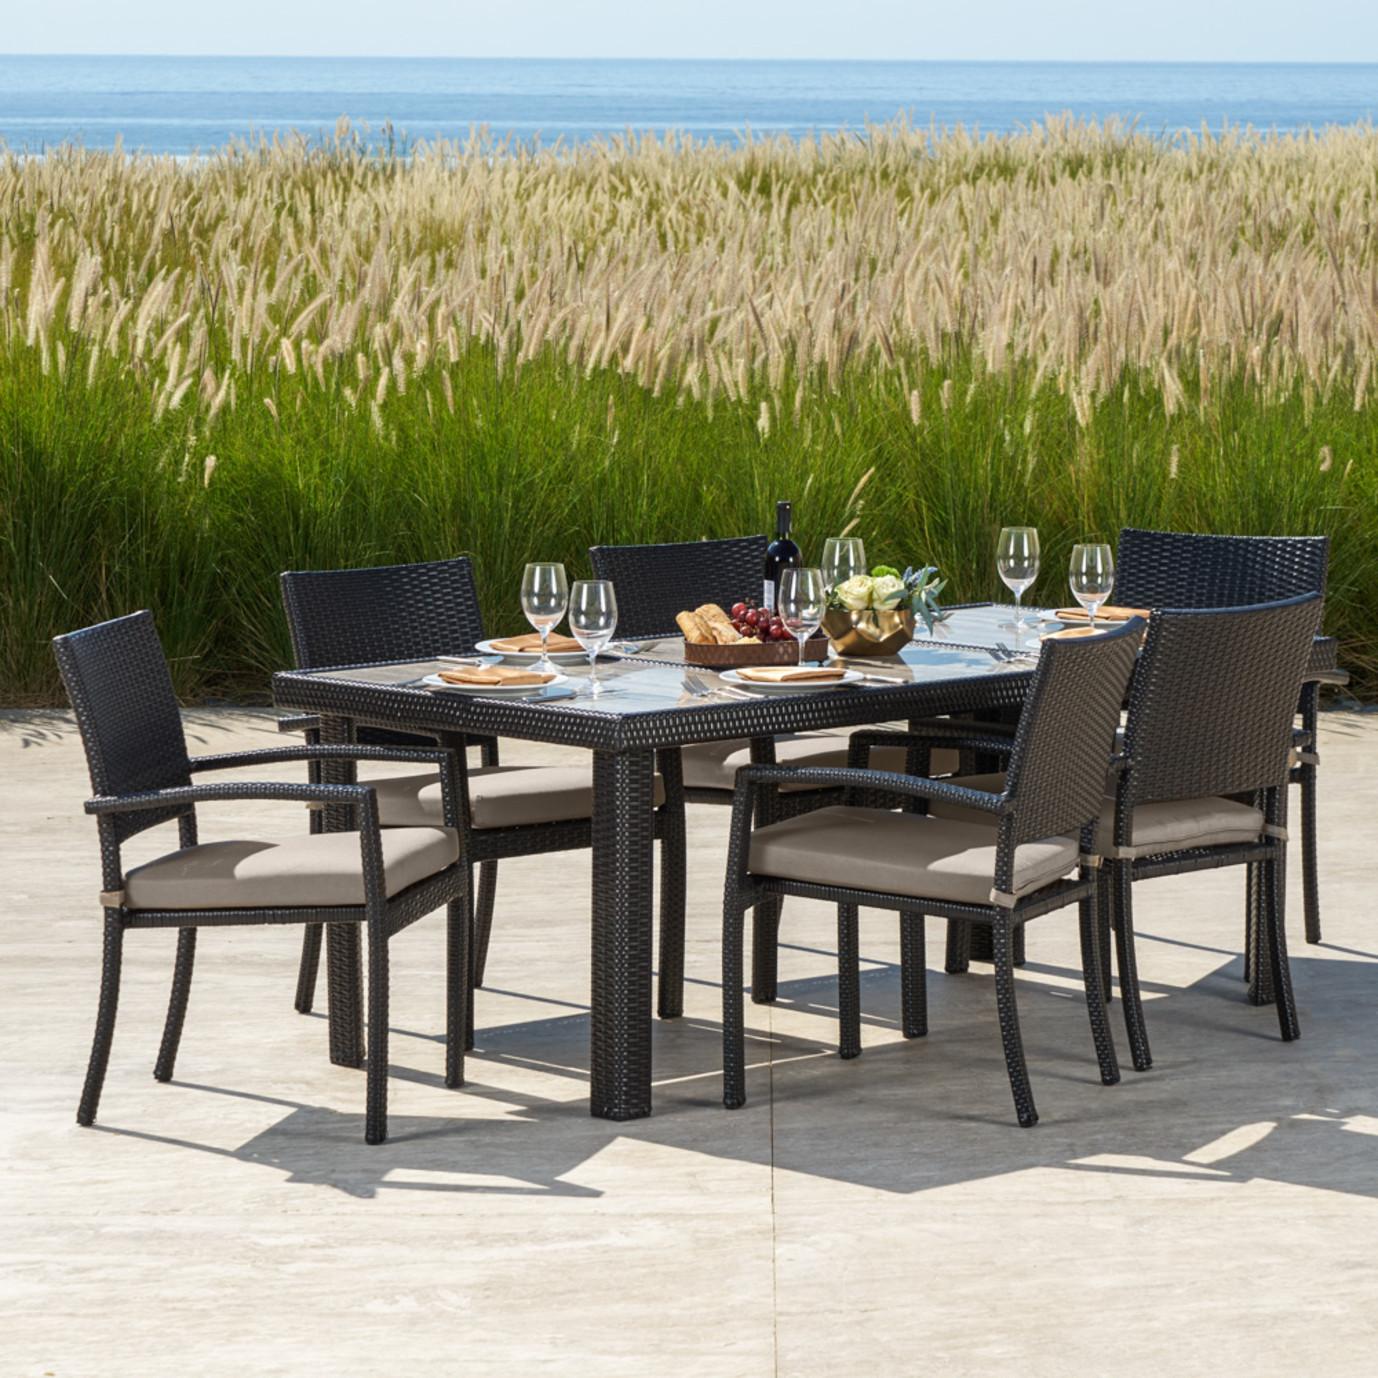 Portofino Comfort 7pc Dining Set Rst Brands